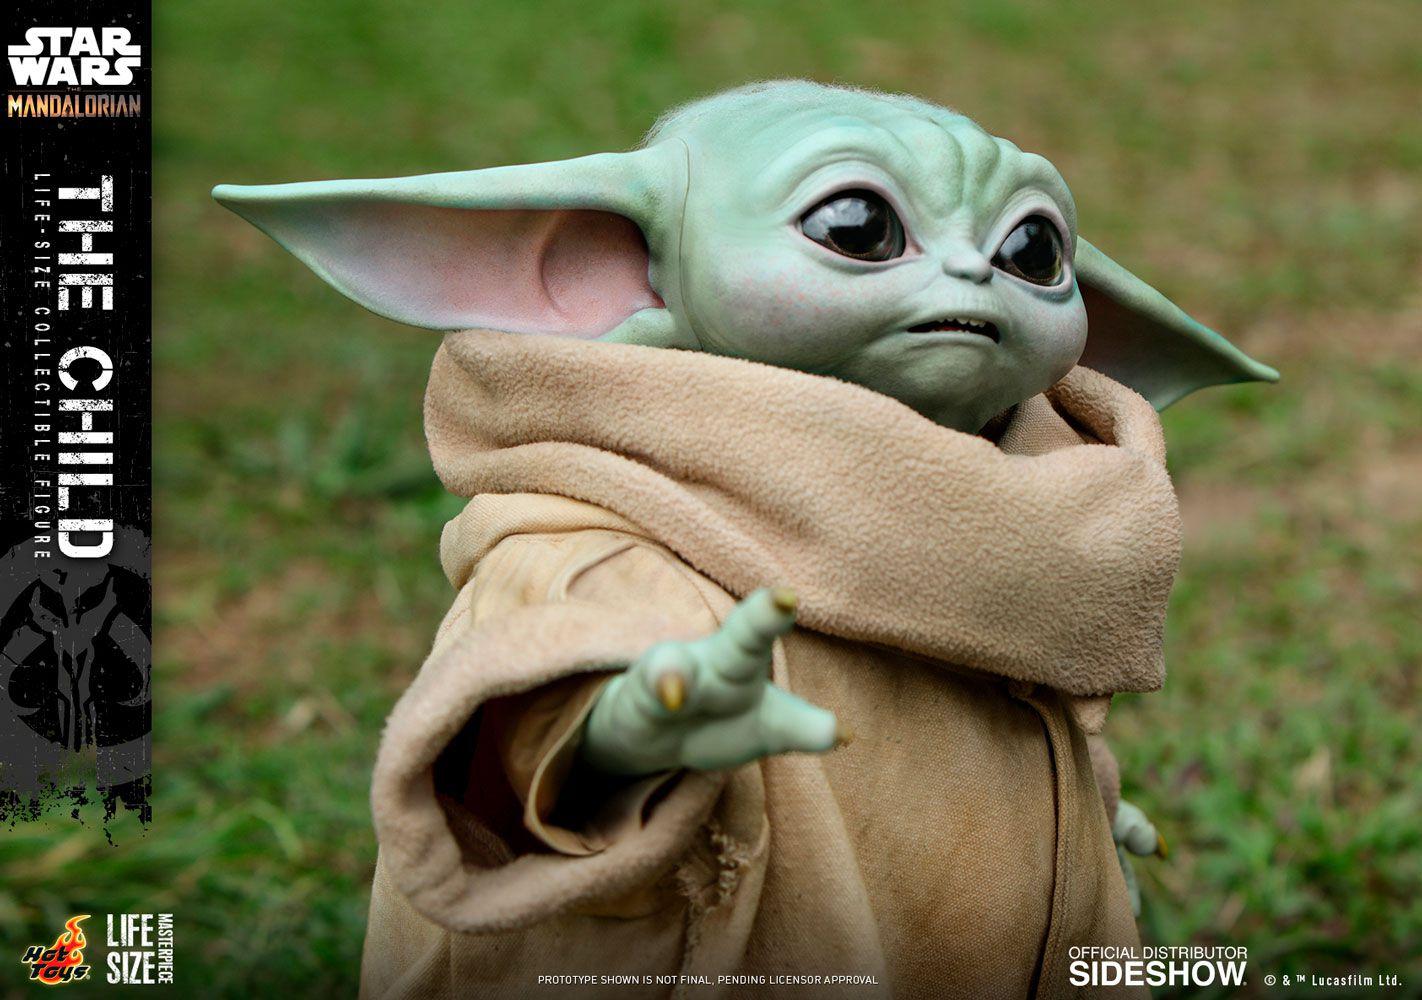 PRÉ VENDA: Action Figure Baby Yoda (The Child): The Mandalorian (Star Wars) Life-Size Masterpiece Series (LMS013) - Hot Toys